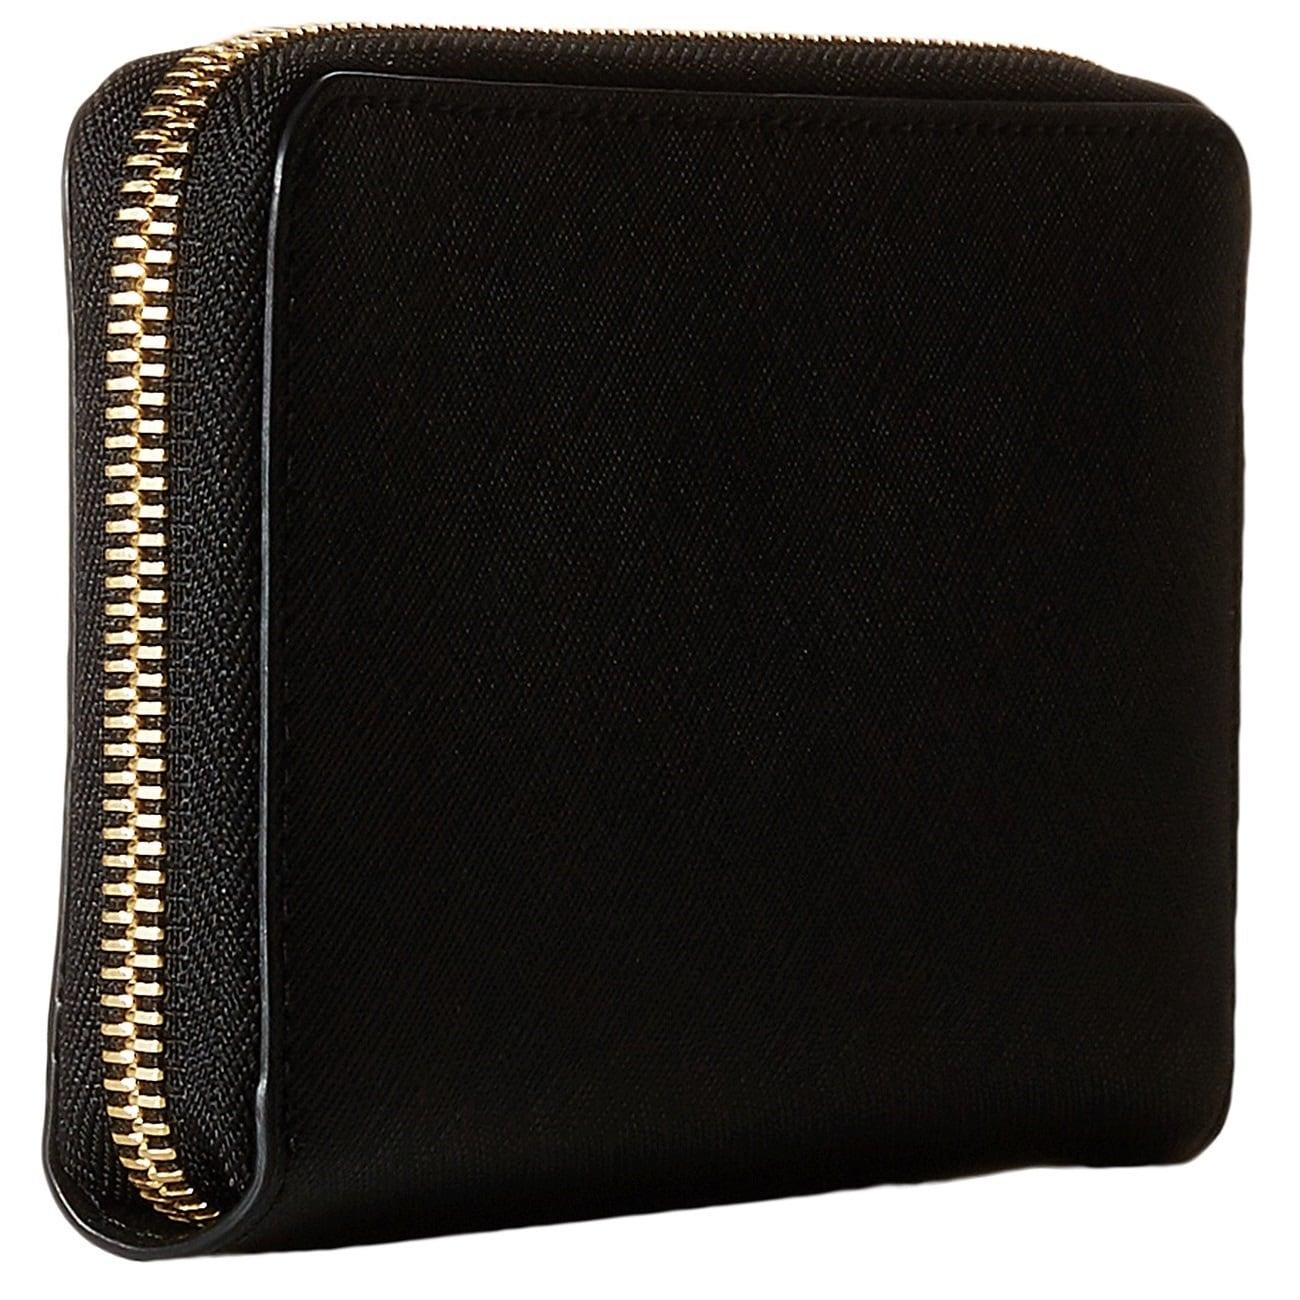 ffd3ca36c28e Shop Michael Kors Jet Set Travel Large Black Smartphone Wrislet Wallet - Free  Shipping Today - - 12186054